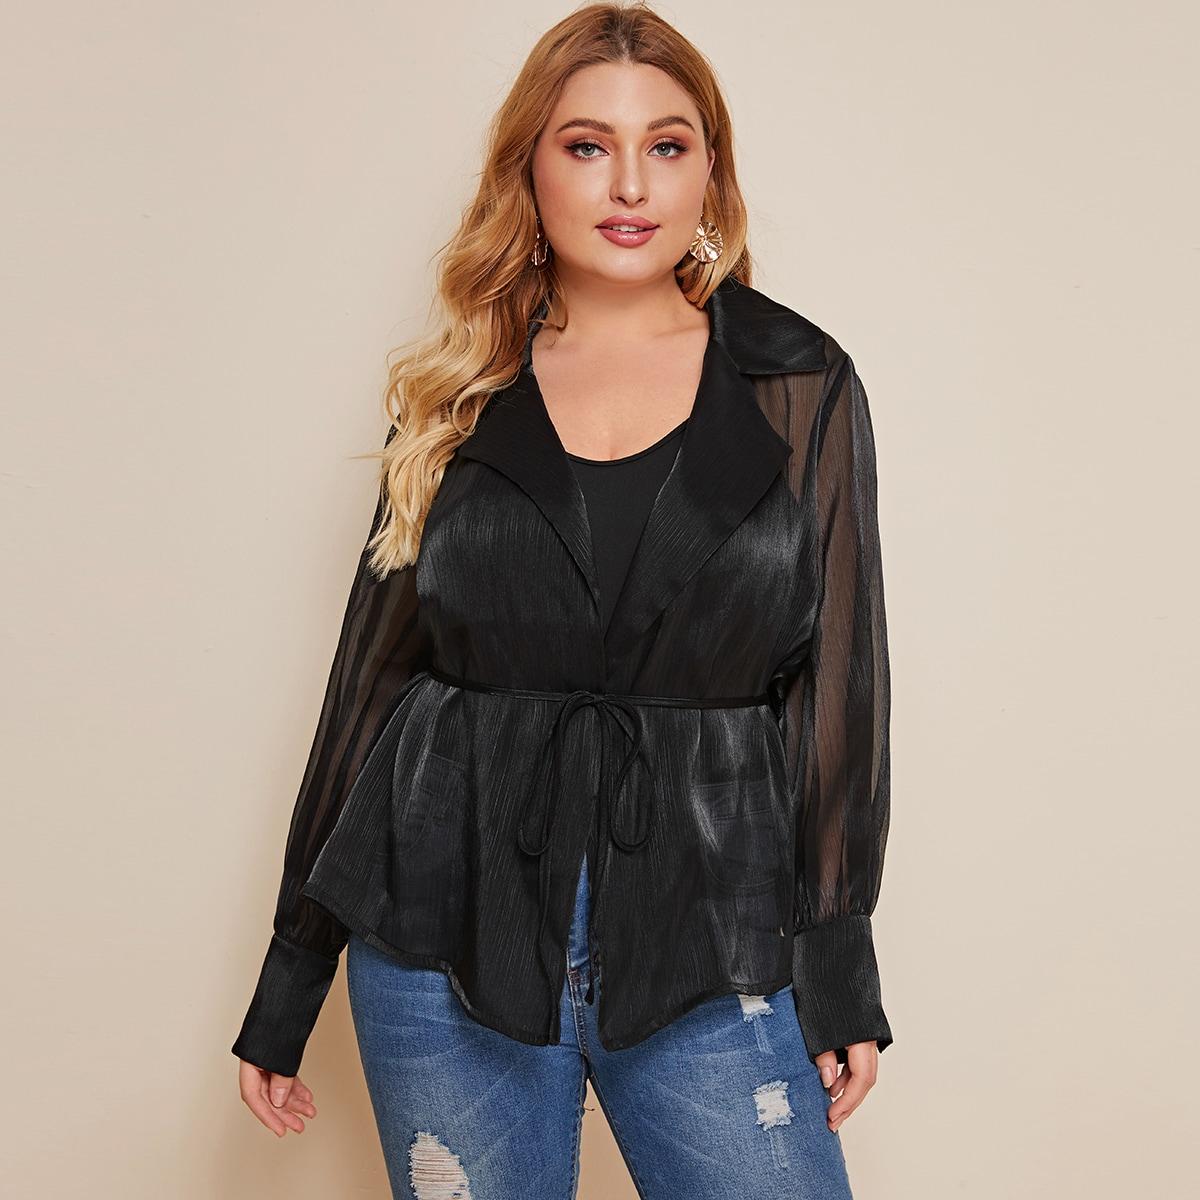 Полупрозрачная блуза размера плюс с поясом без майки фото